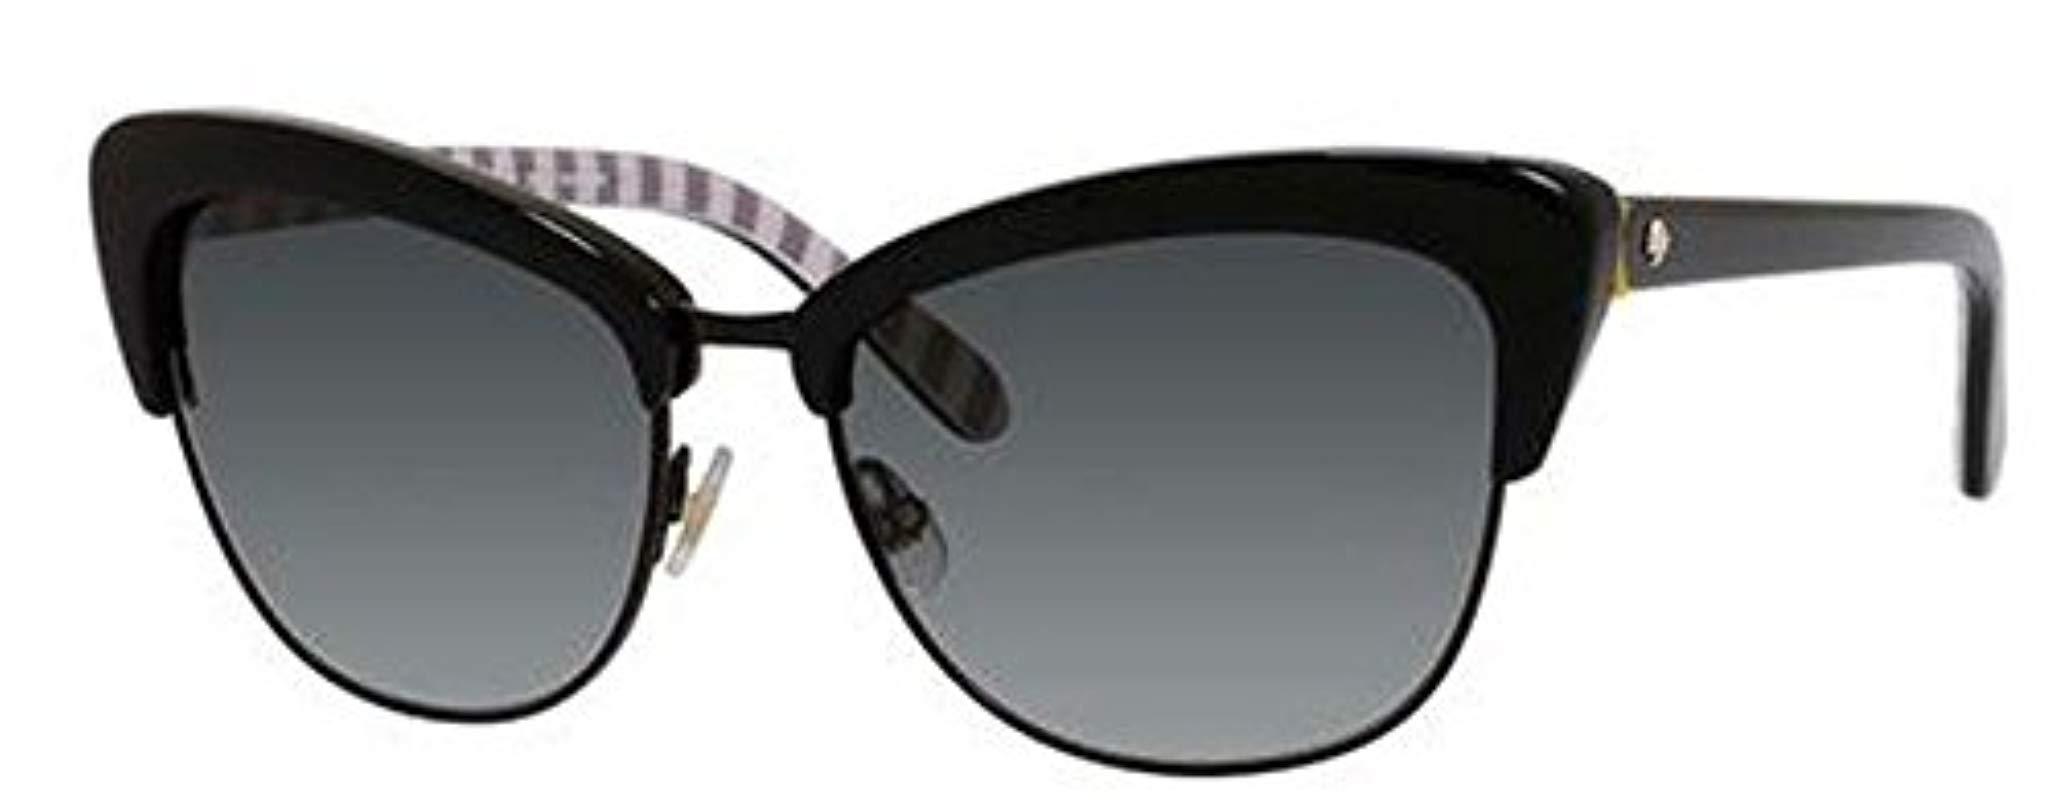 f396ed932b Lyst - Kate Spade Genette Cat-eye Sunglasses in Black - Save ...